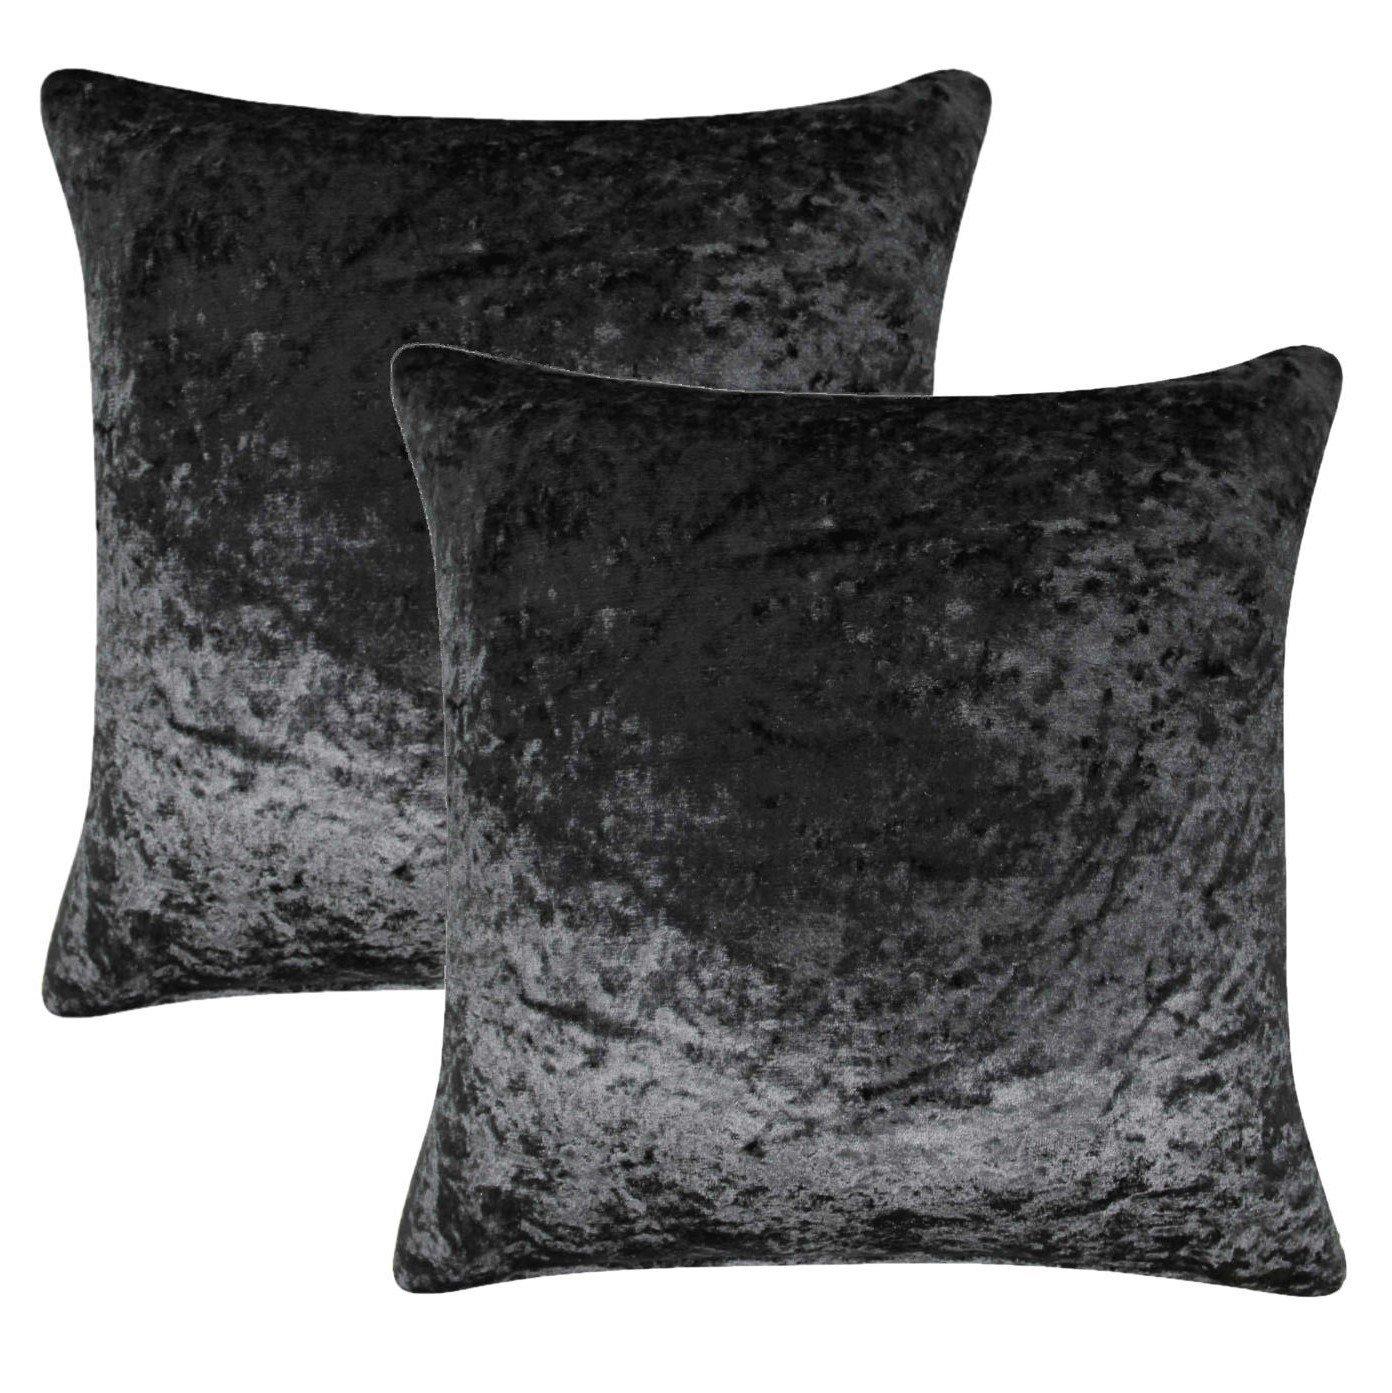 black velvet cushions amazon co uk rh amazon co uk black velvet cushions uk black velvet cushions australia